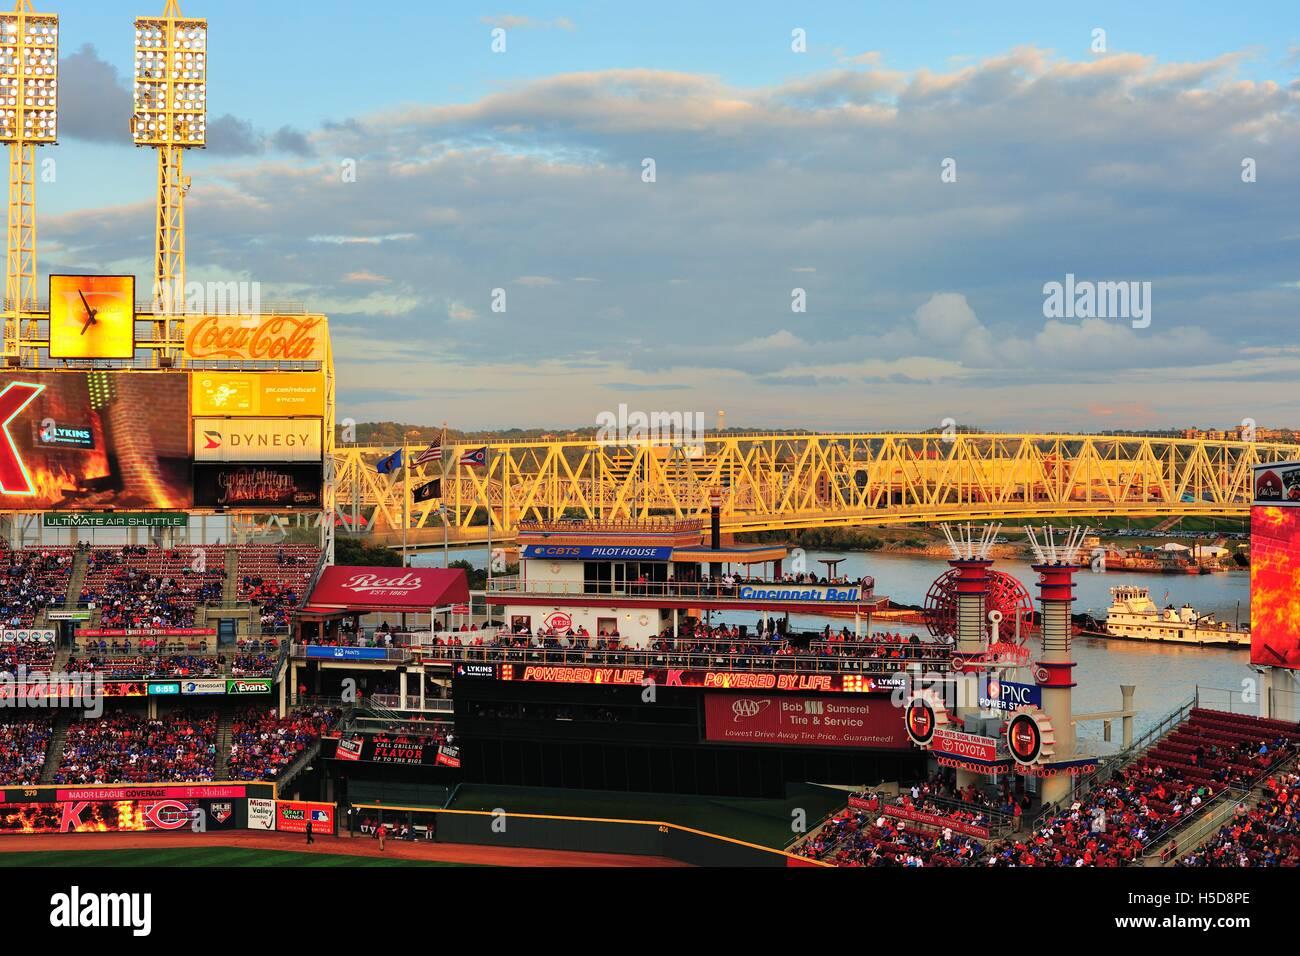 The Great American Ballpark, home to the Cincinnati Reds along the banks of the Ohio River. Cincinnati, Ohio, USA. - Stock Image